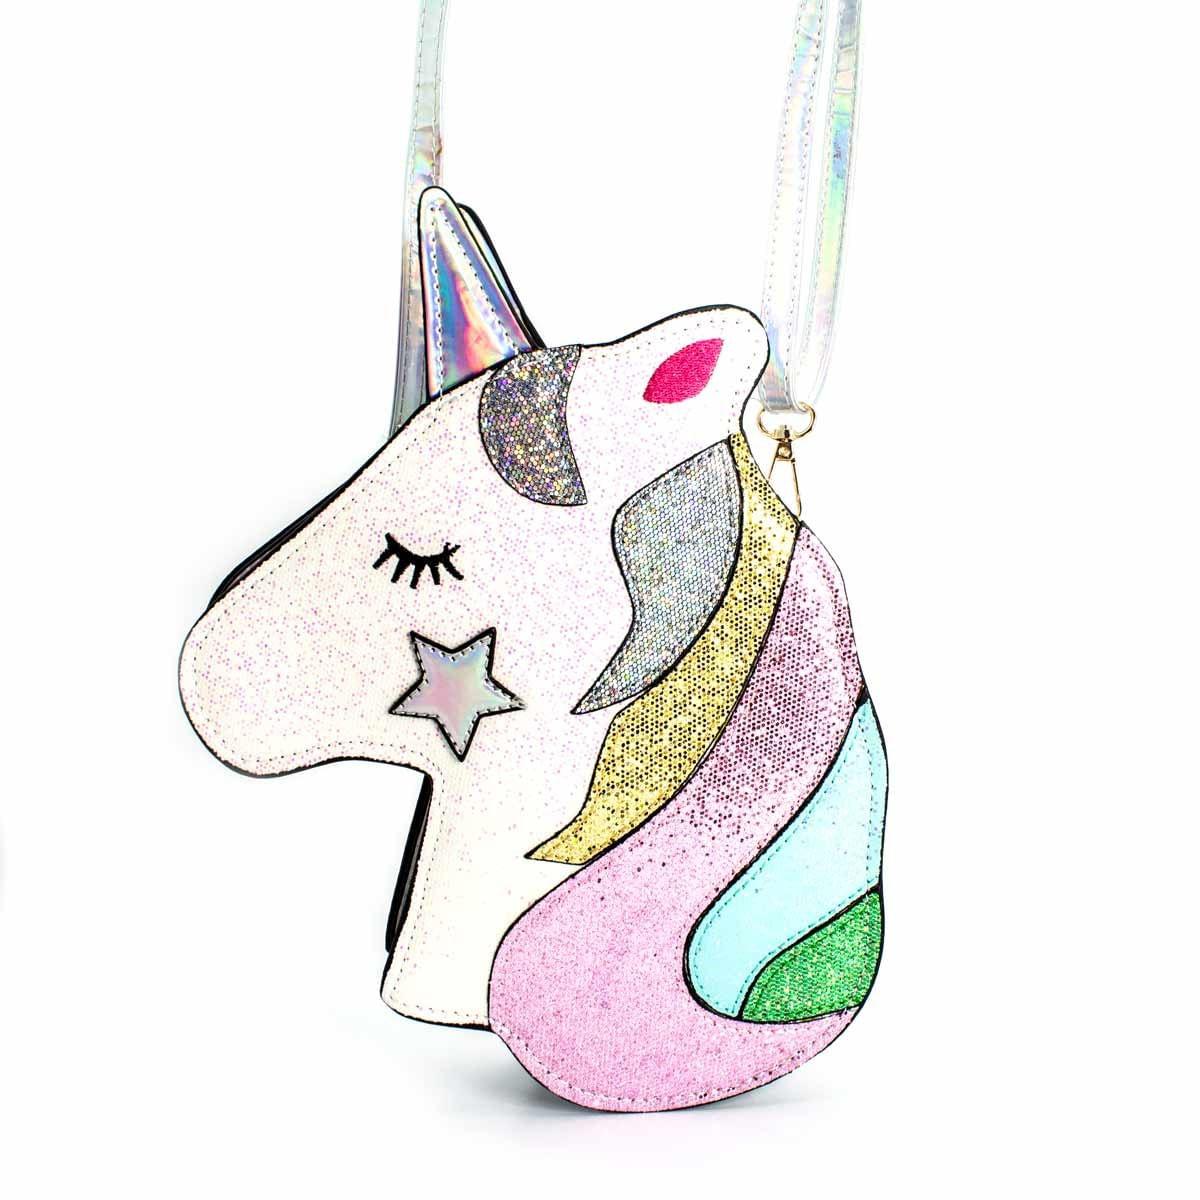 Bolsa-Infantil-Unicornio-Luxo-Ludique-et-Badin